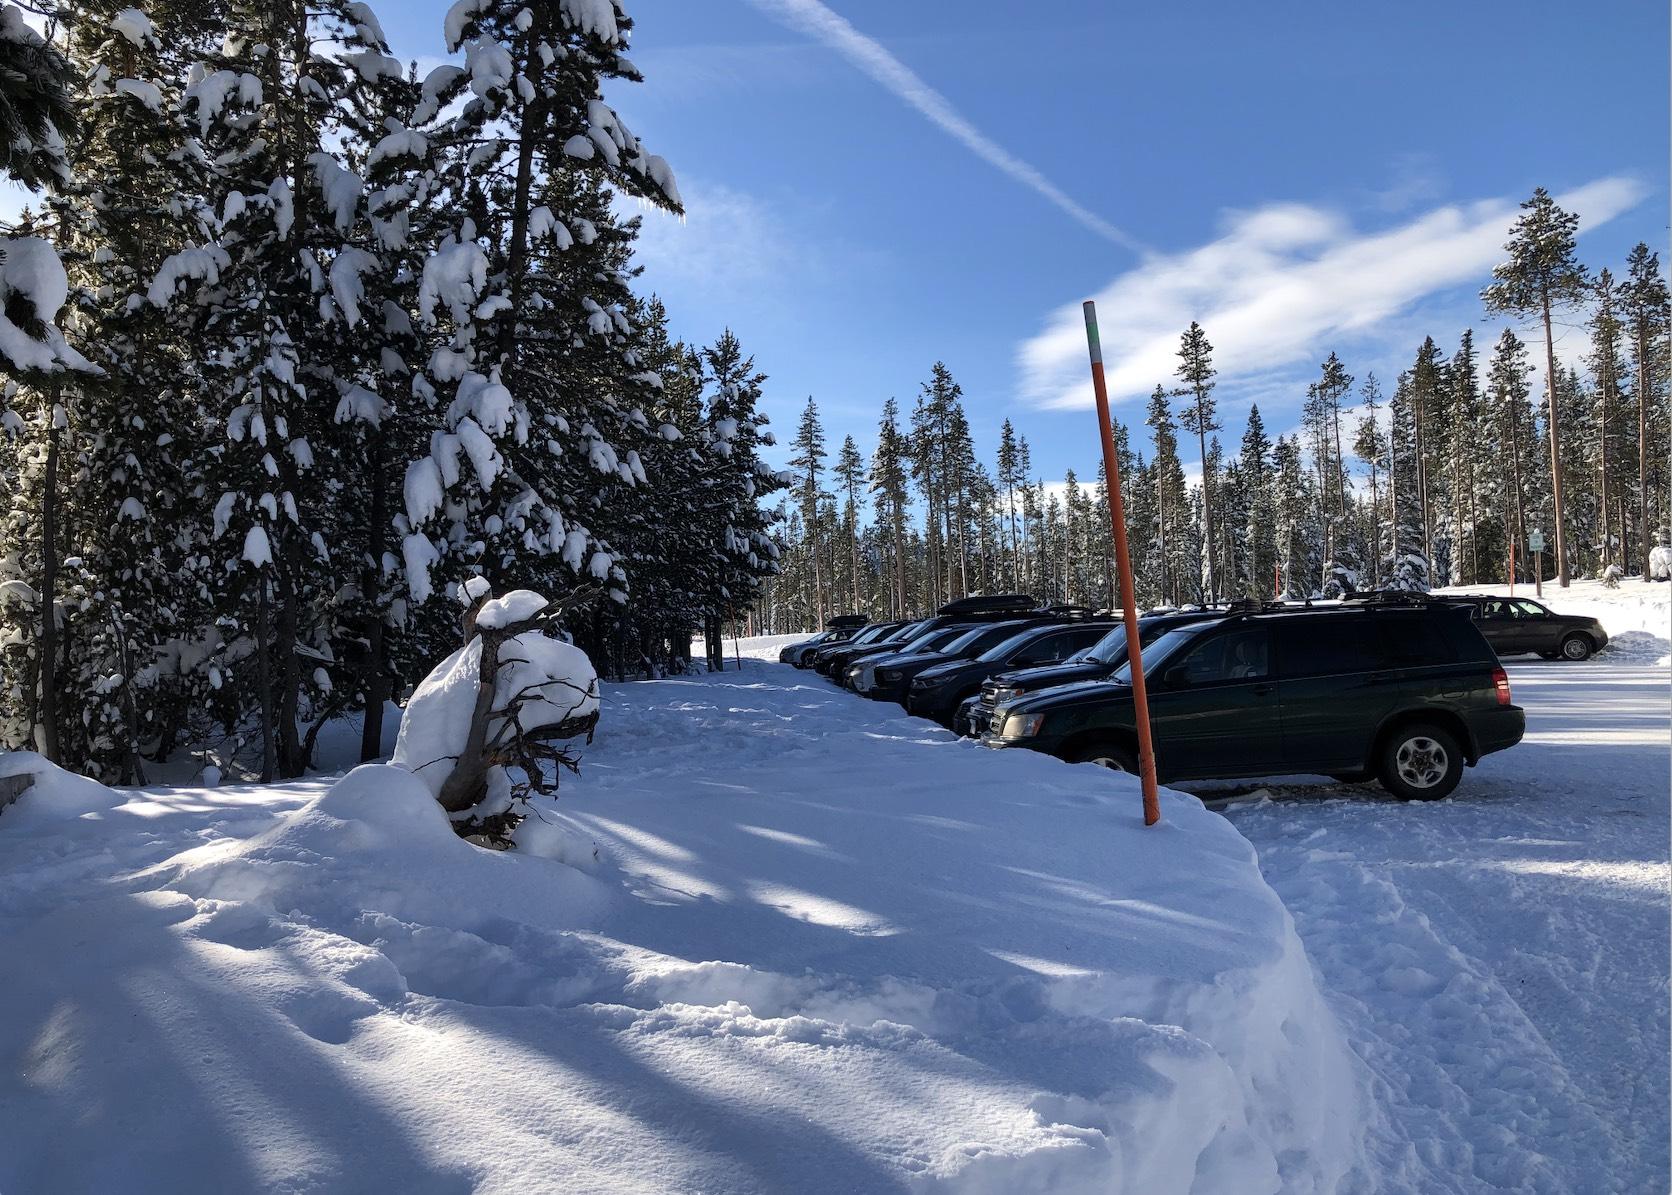 oregon, snow, skiiing